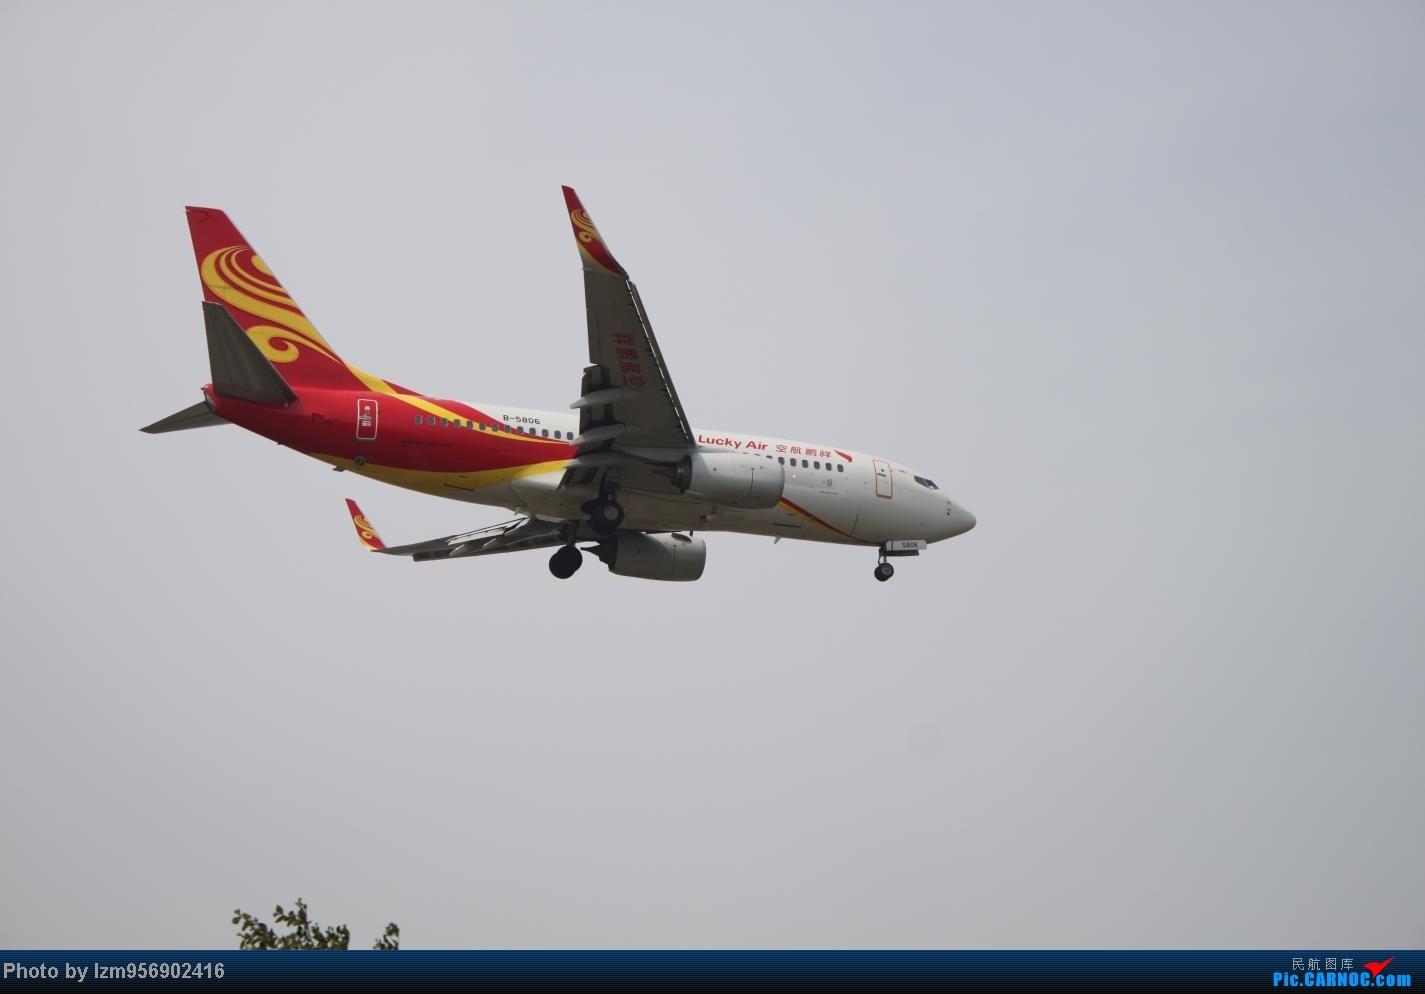 Re:[原创]DLC蹲点大半天,拍到了大棒航空772=w= BOEING 737-700 B-5806 中国大连周水子机场